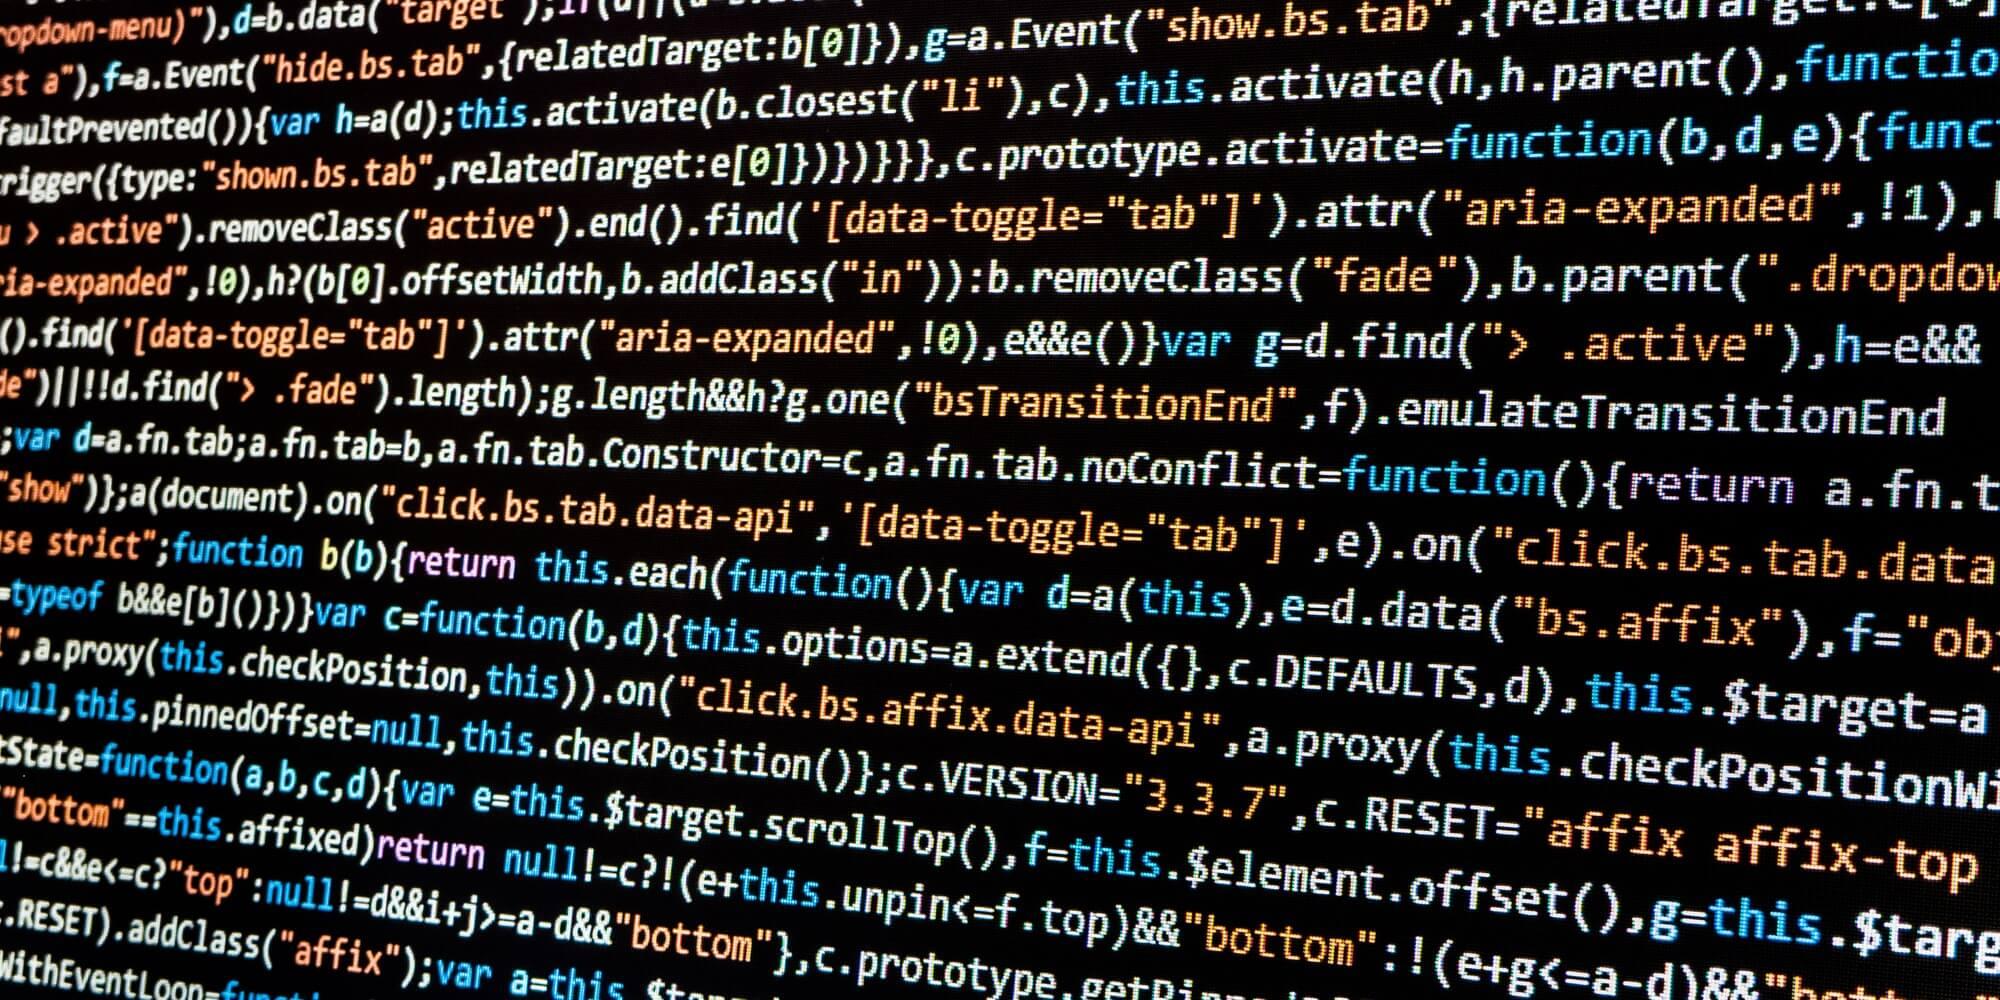 Computing code